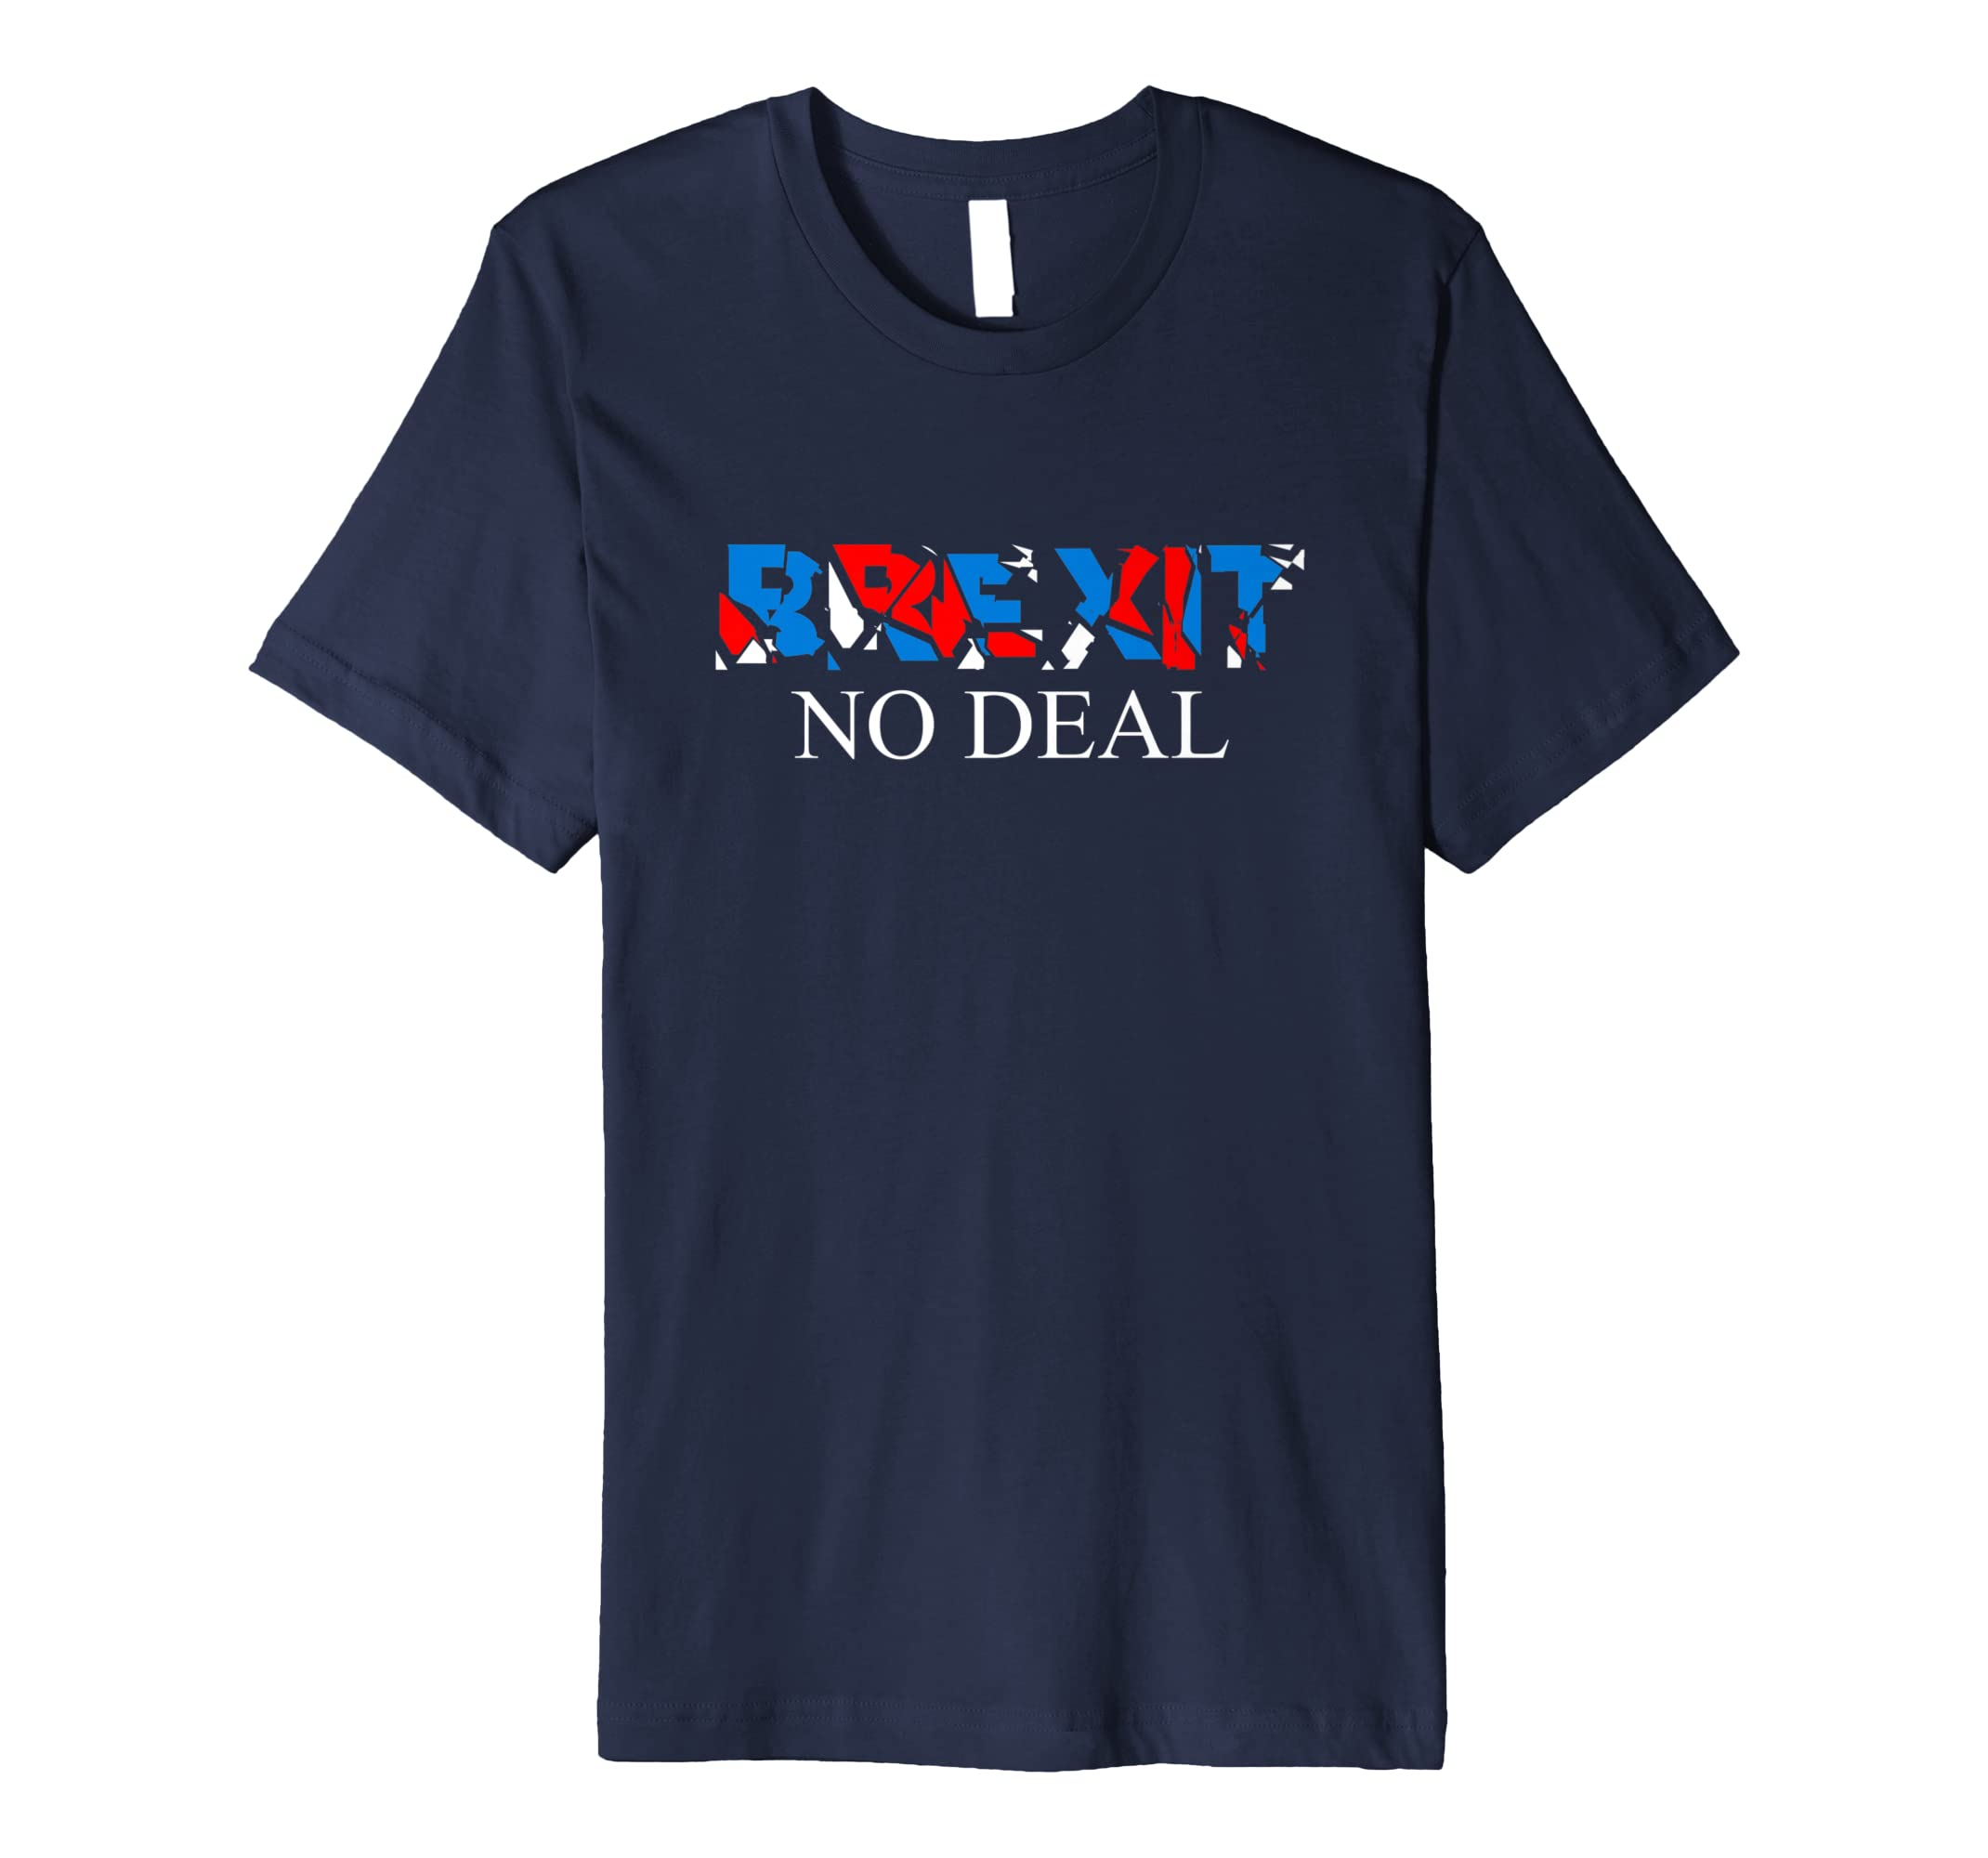 9042de9b Brexit No Deal T-Shirt Brexit tshirt, Brexit Gifts: Amazon.co.uk: Clothing